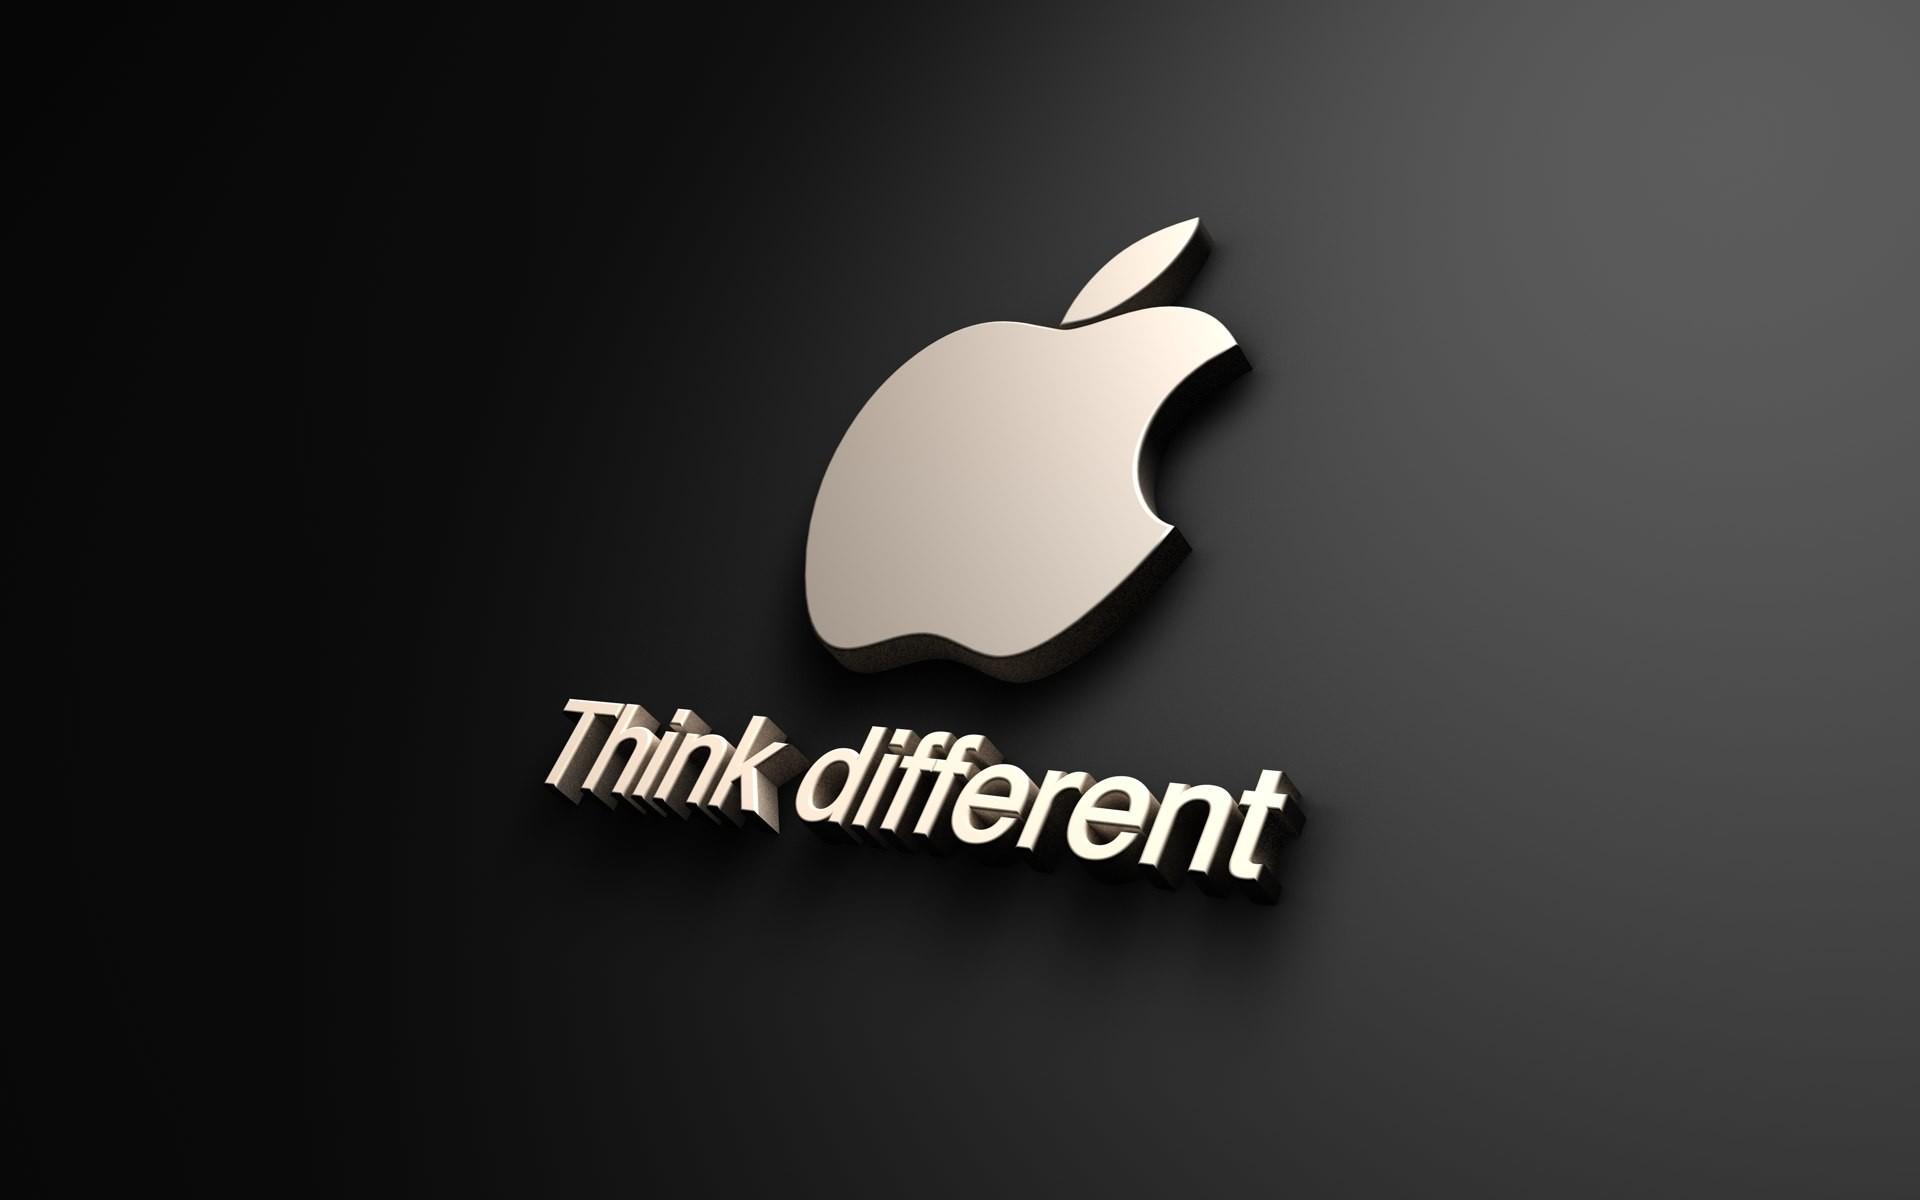 Apple Logo Wallpaper .